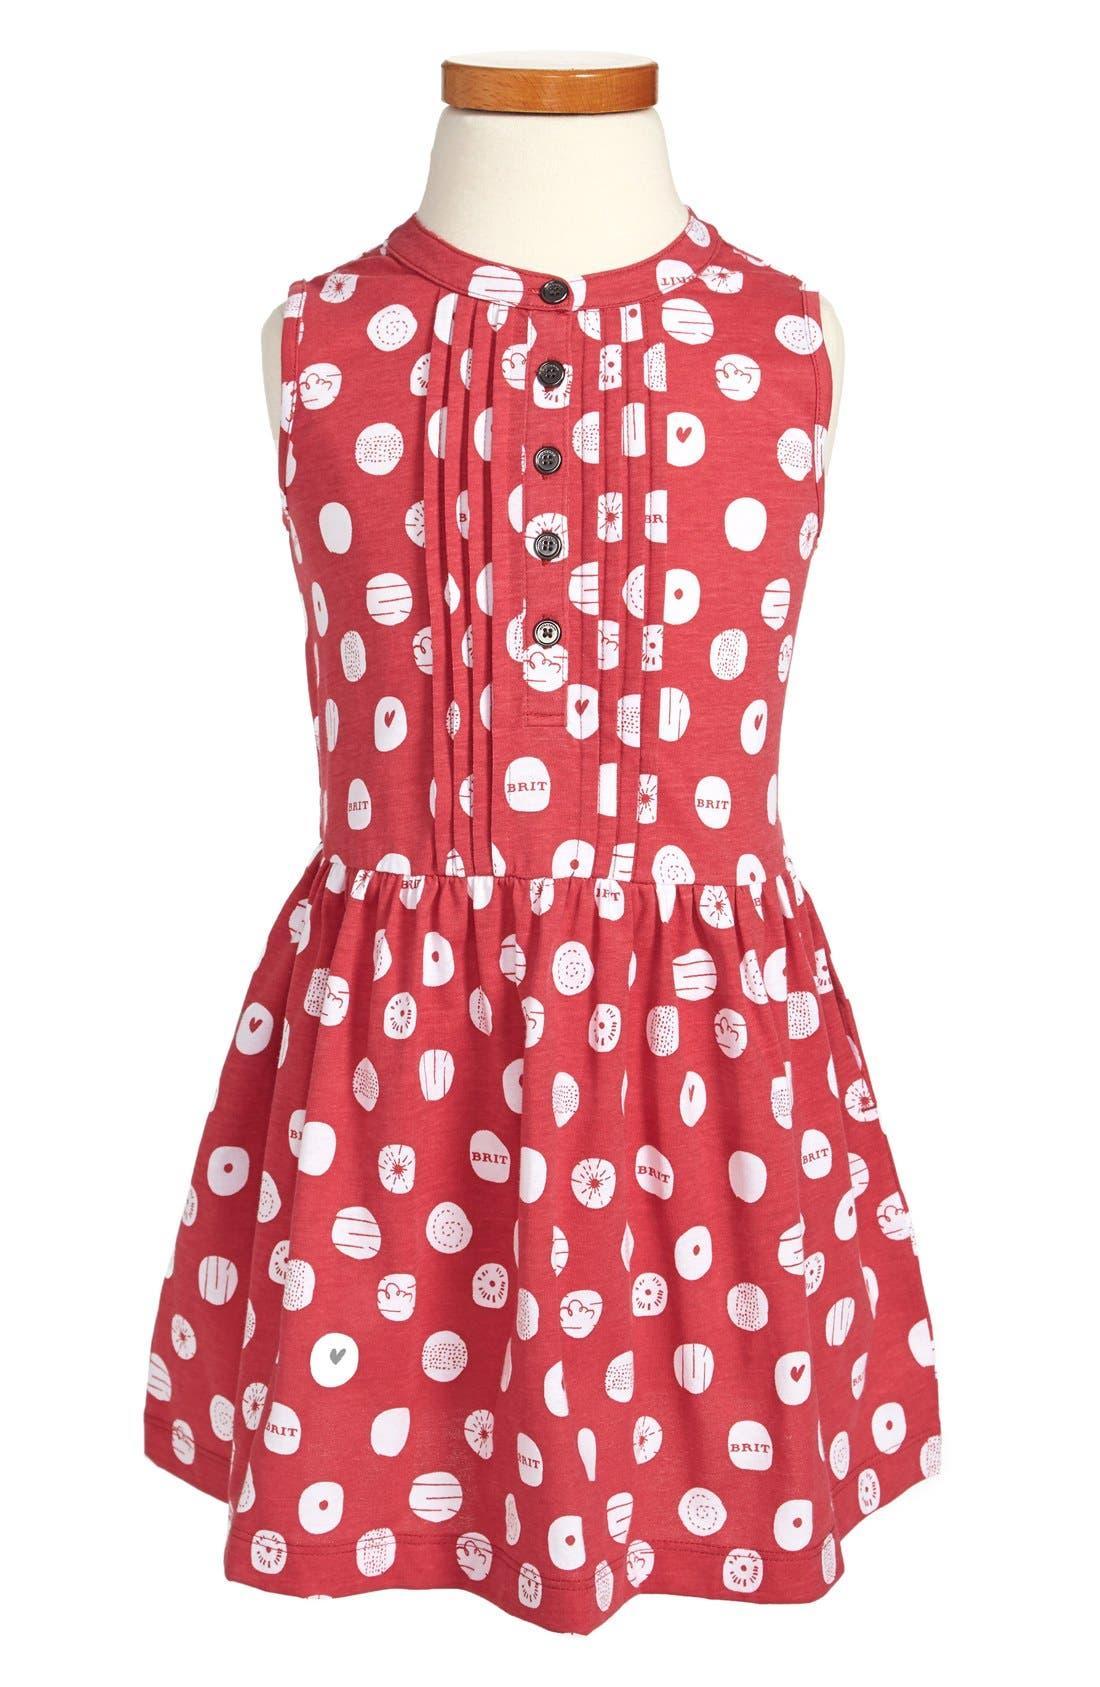 Main Image - Burberry Sleeveless Print Dress (Toddler Girls, Little Girls & Big Girls)